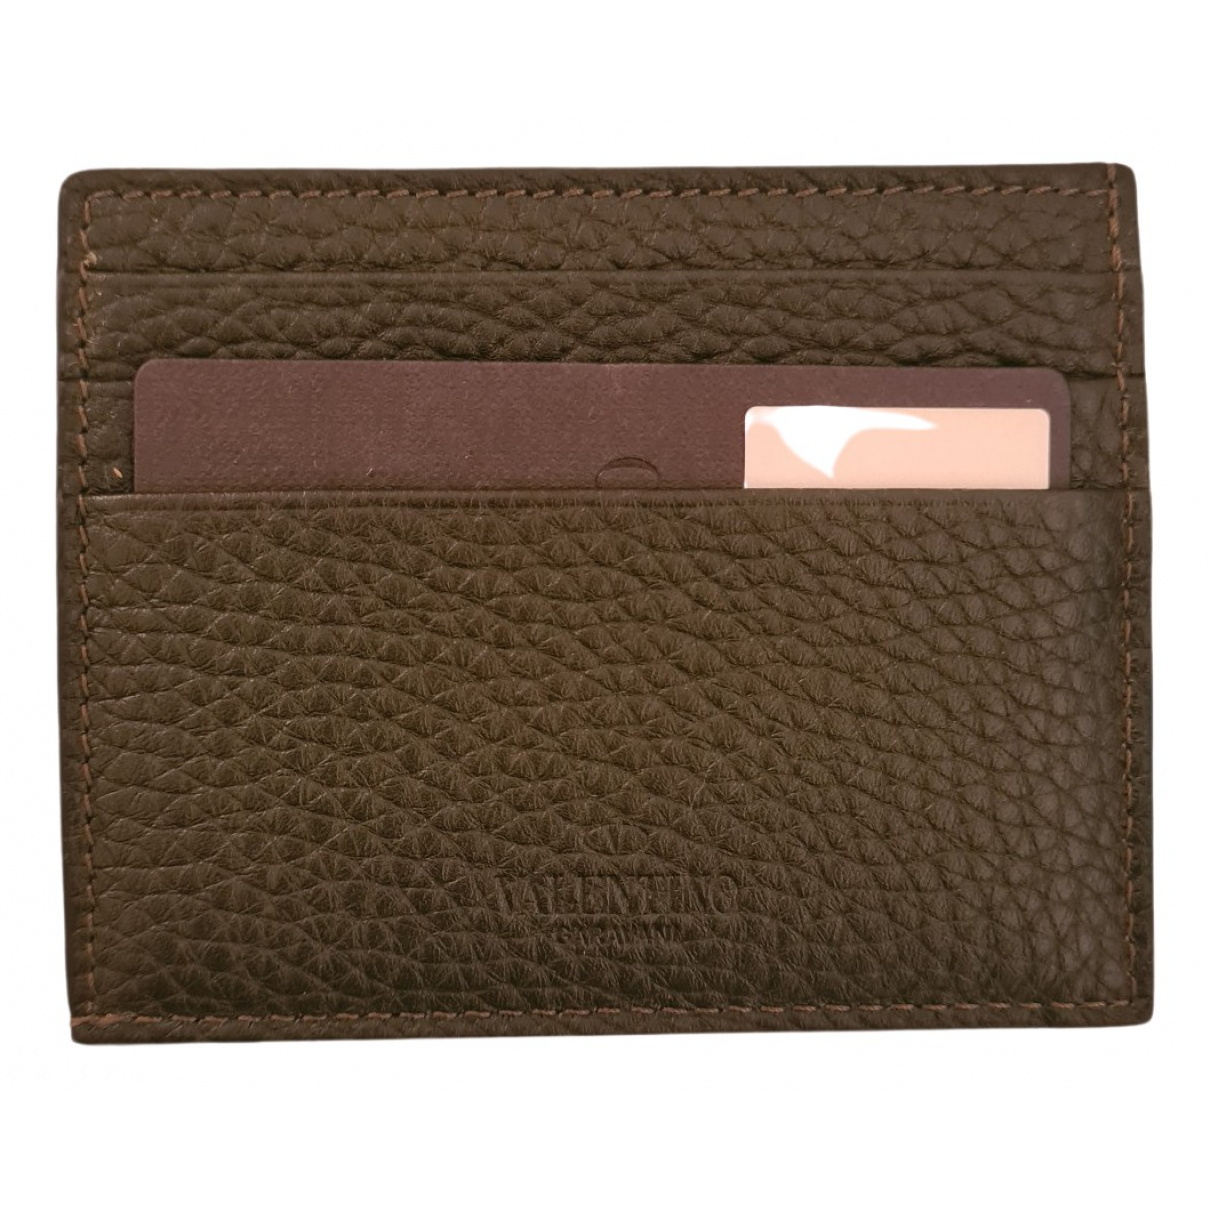 Valentino Garavani \N Green Leather Small bag, wallet & cases for Men \N